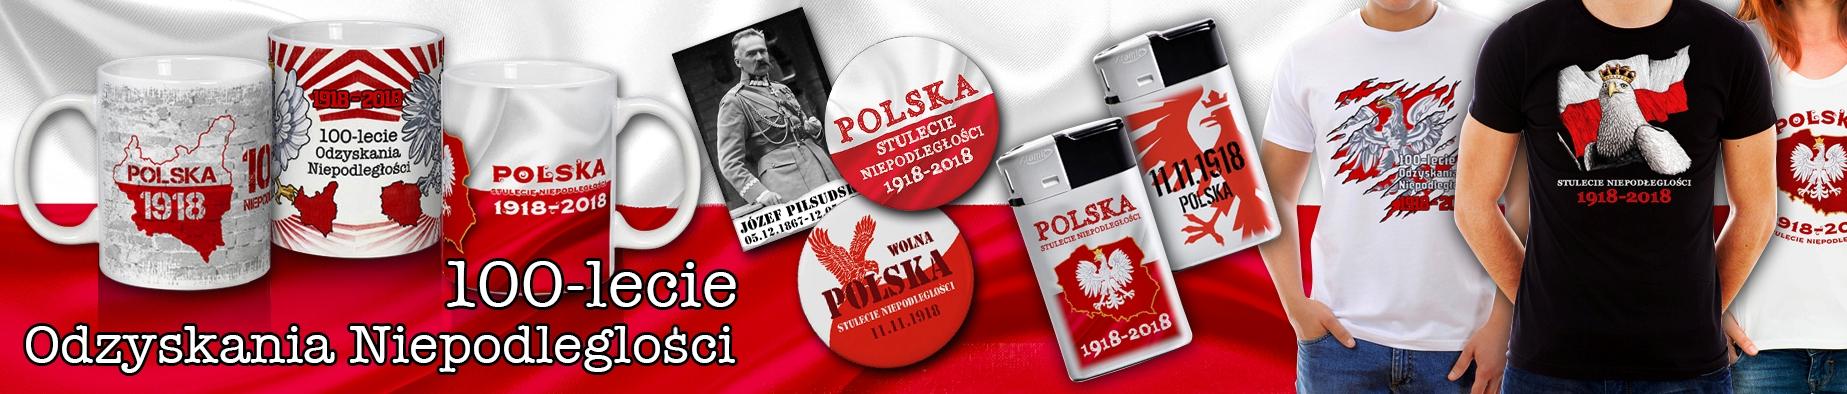 100-lecie wolnej Polski